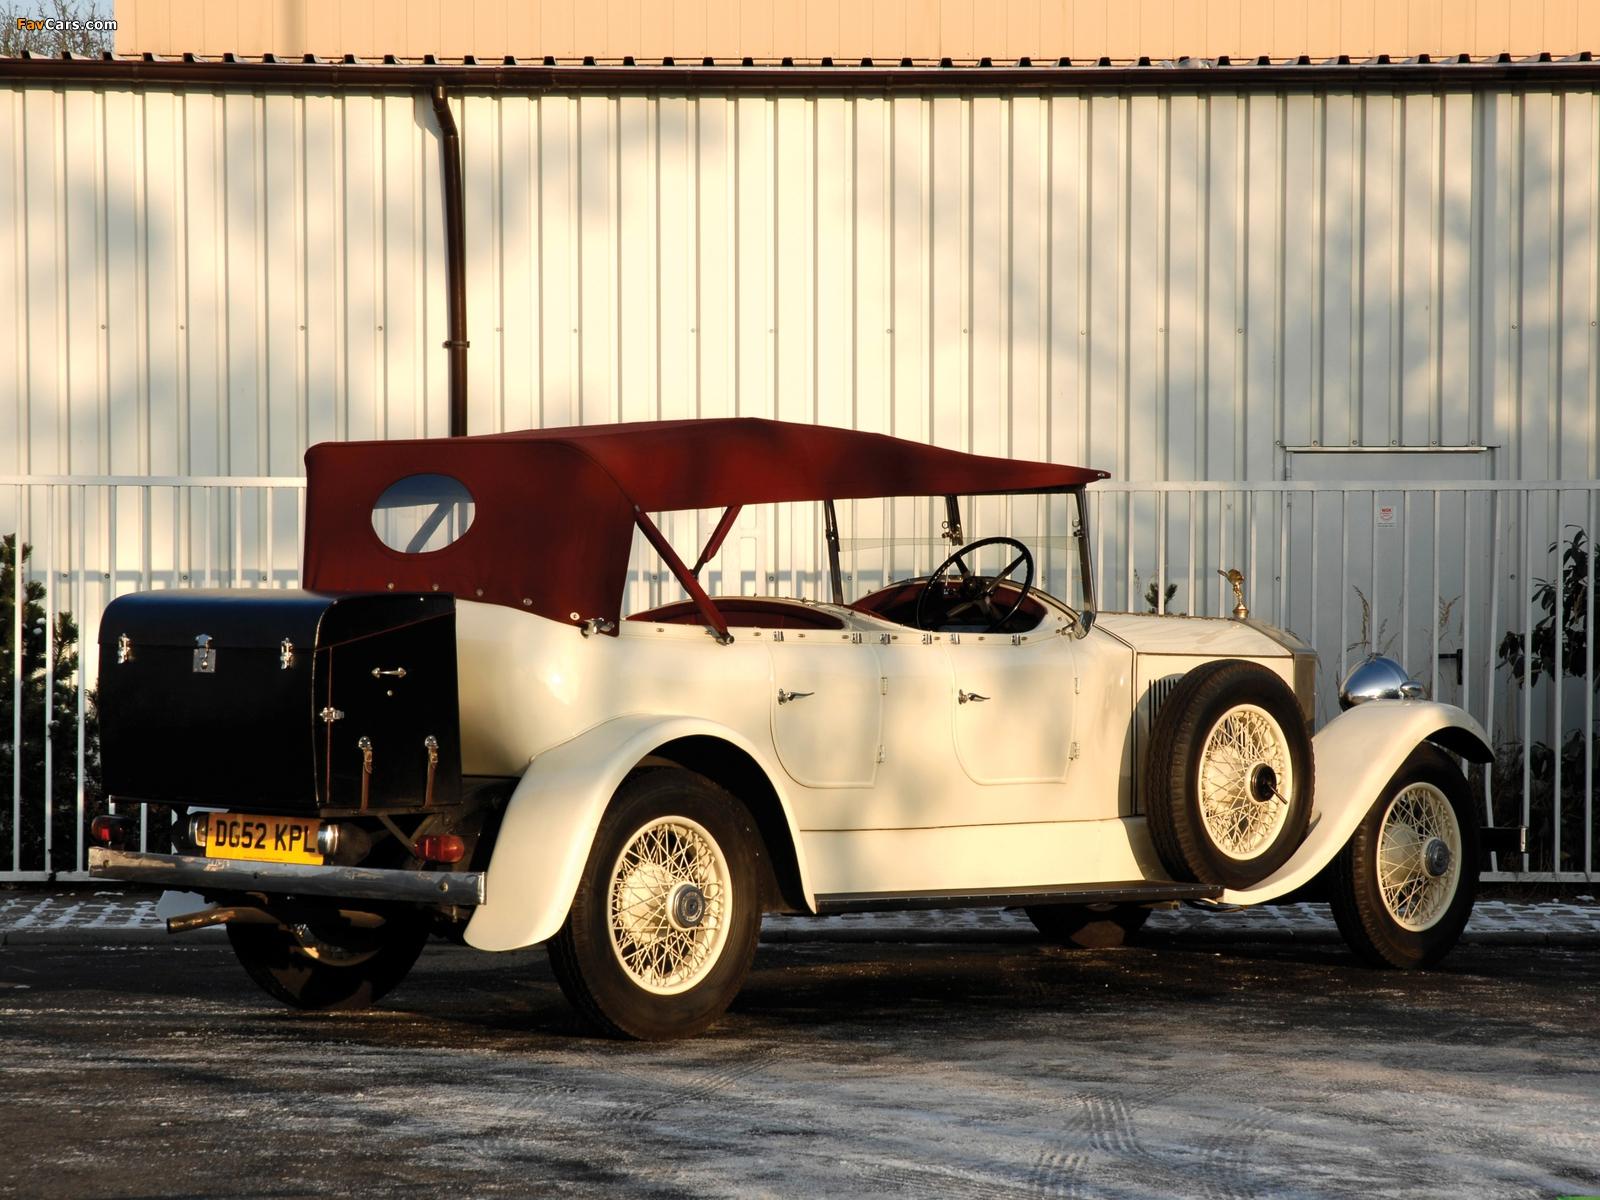 Rolls-Royce Phantom II 40/50 HP Open Tourer 1929 photos (1600 x 1200)